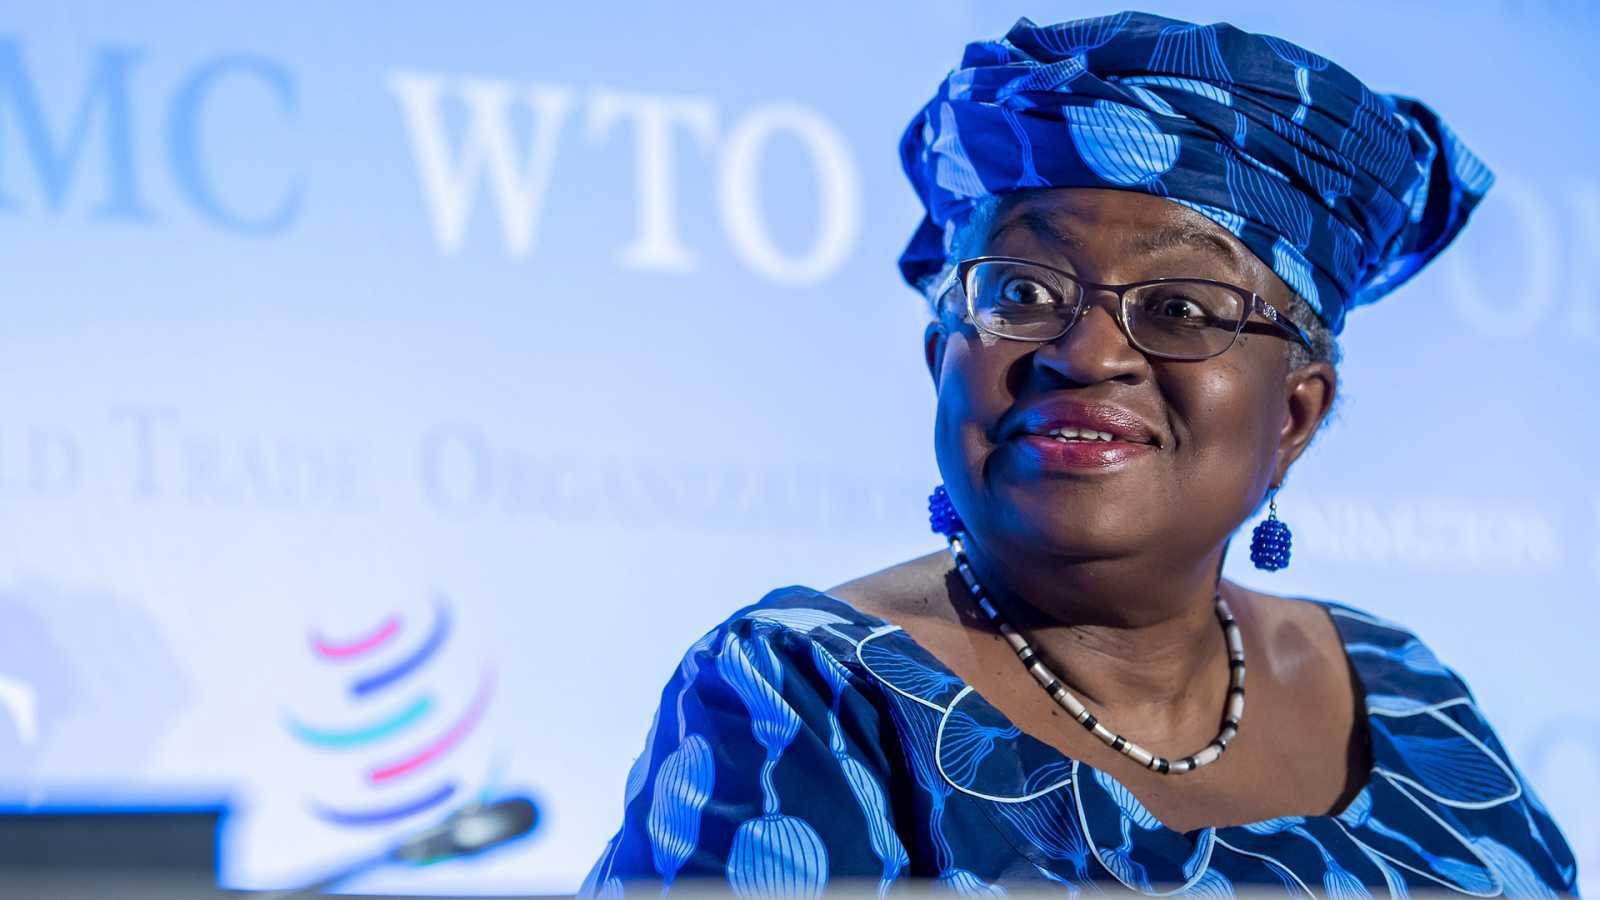 África hoy - Ngozi Okonjo-Iweala primera mujer en liderar la OMC - 19/02/21 - escuchar ahora